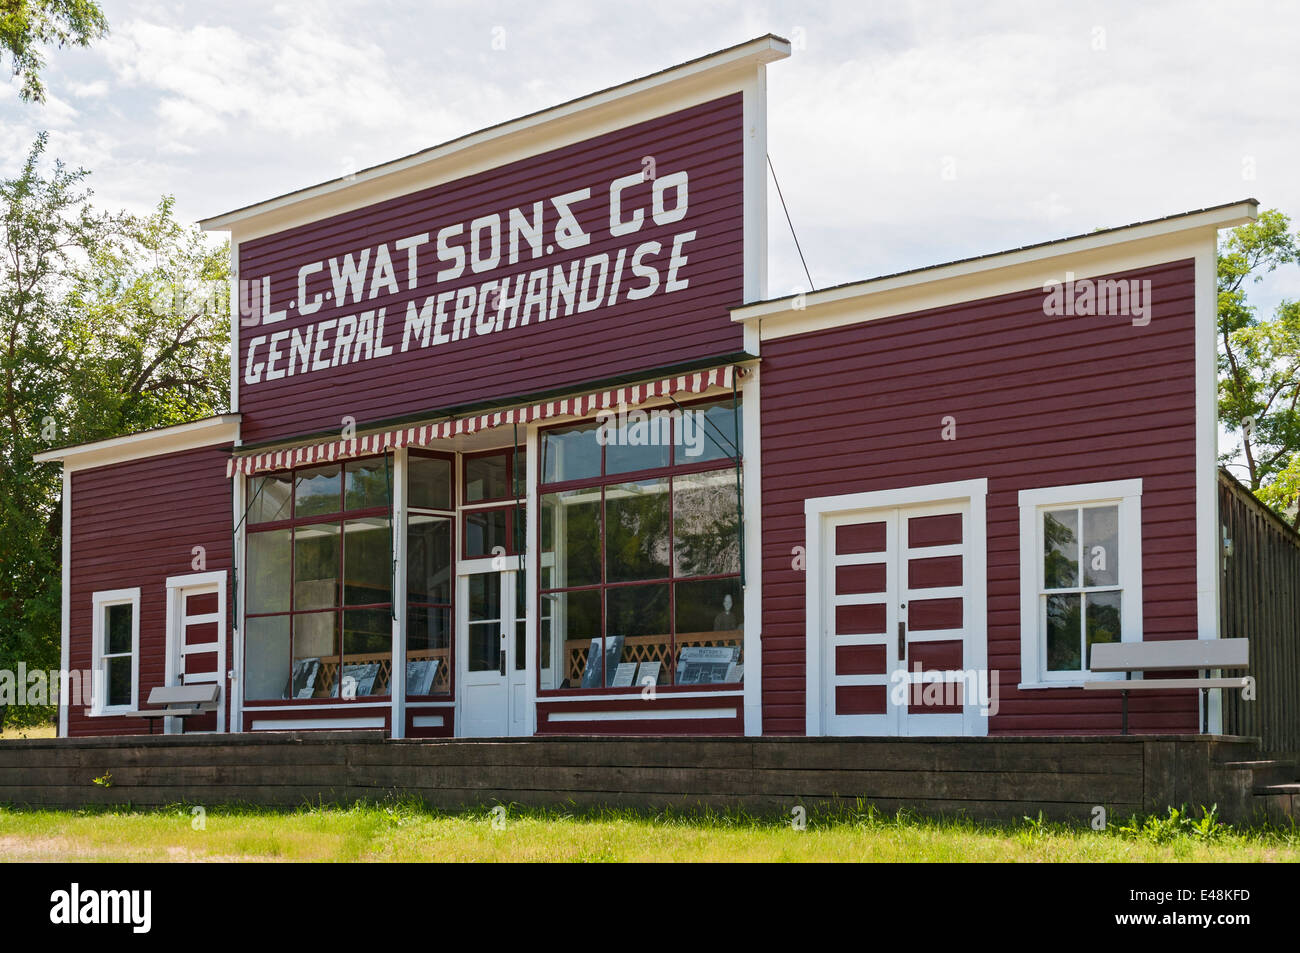 Idaho, Spalding, Nez Perce National Historical Park, Watson's Store, operated 1910-1965 - Stock Image